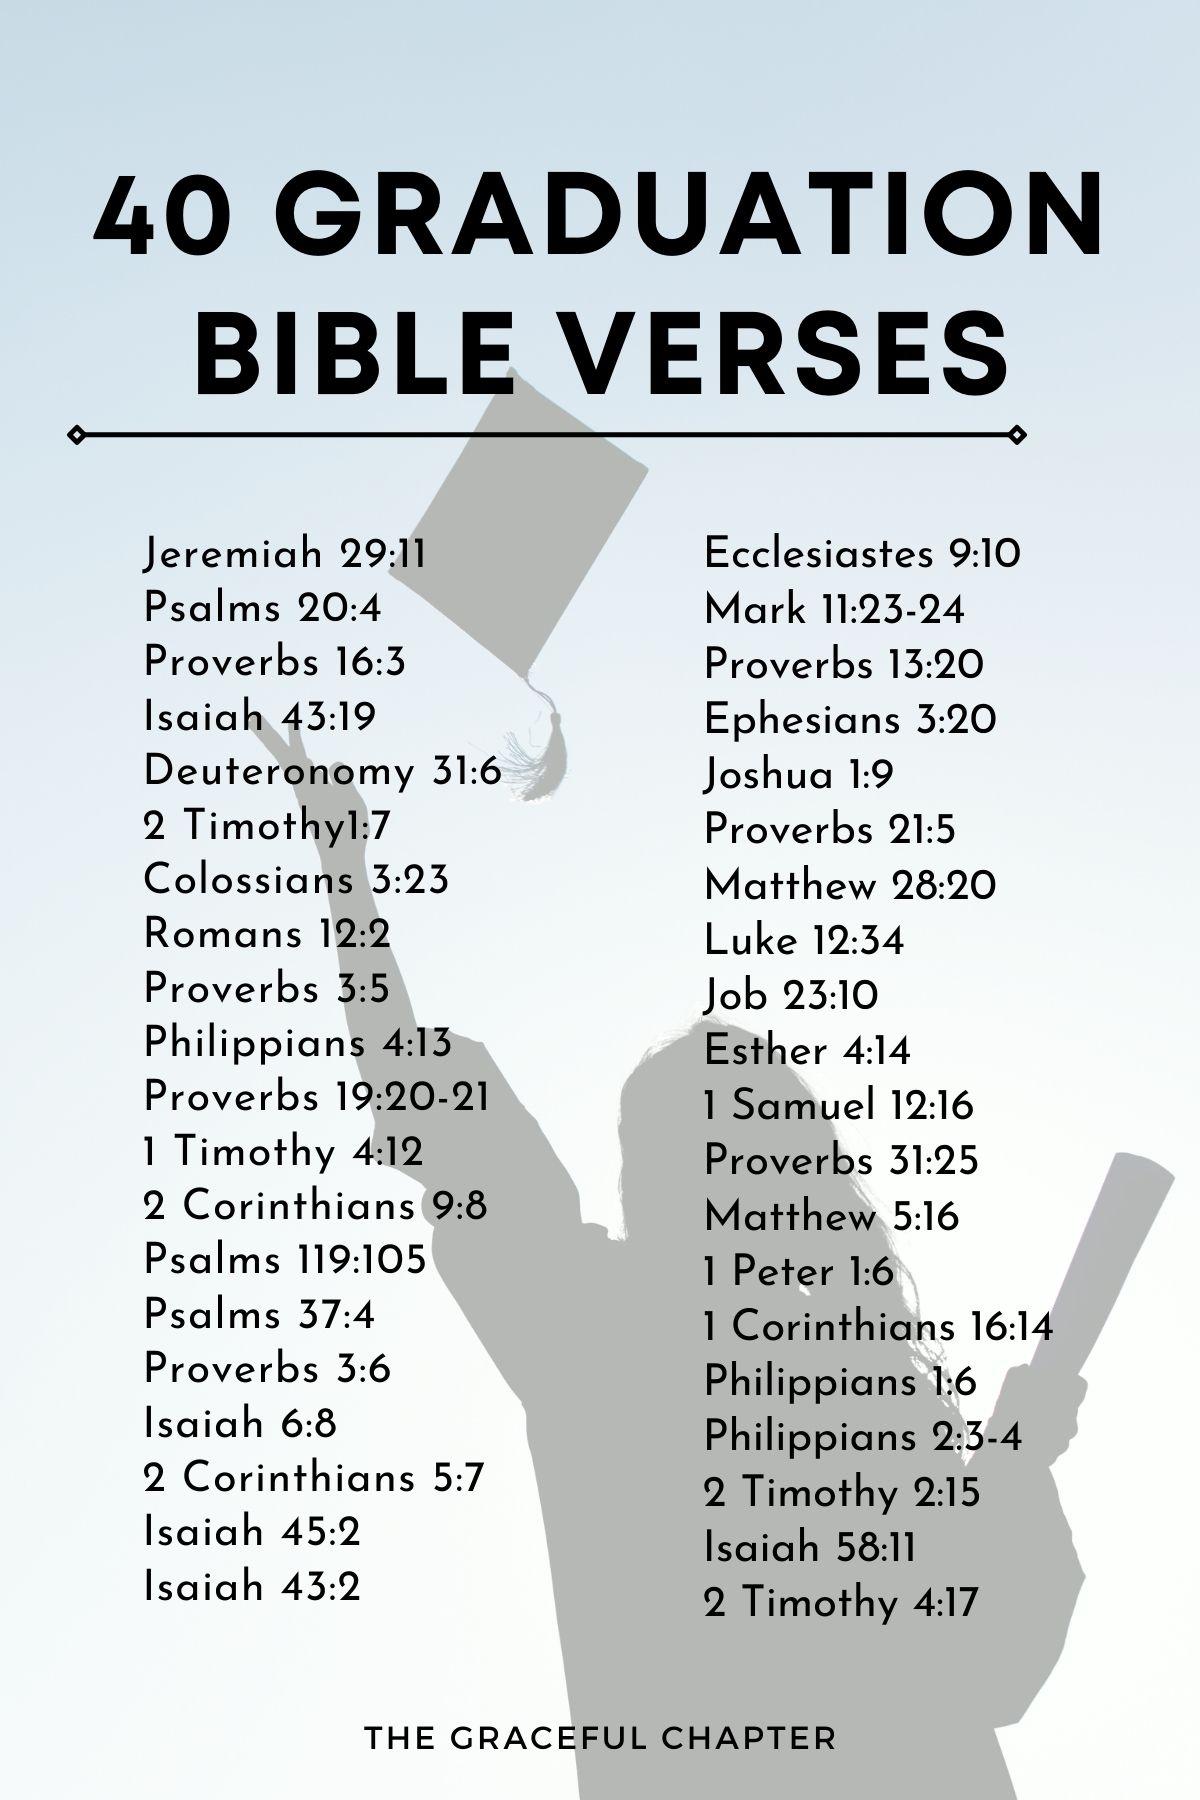 40 graduation bible verses